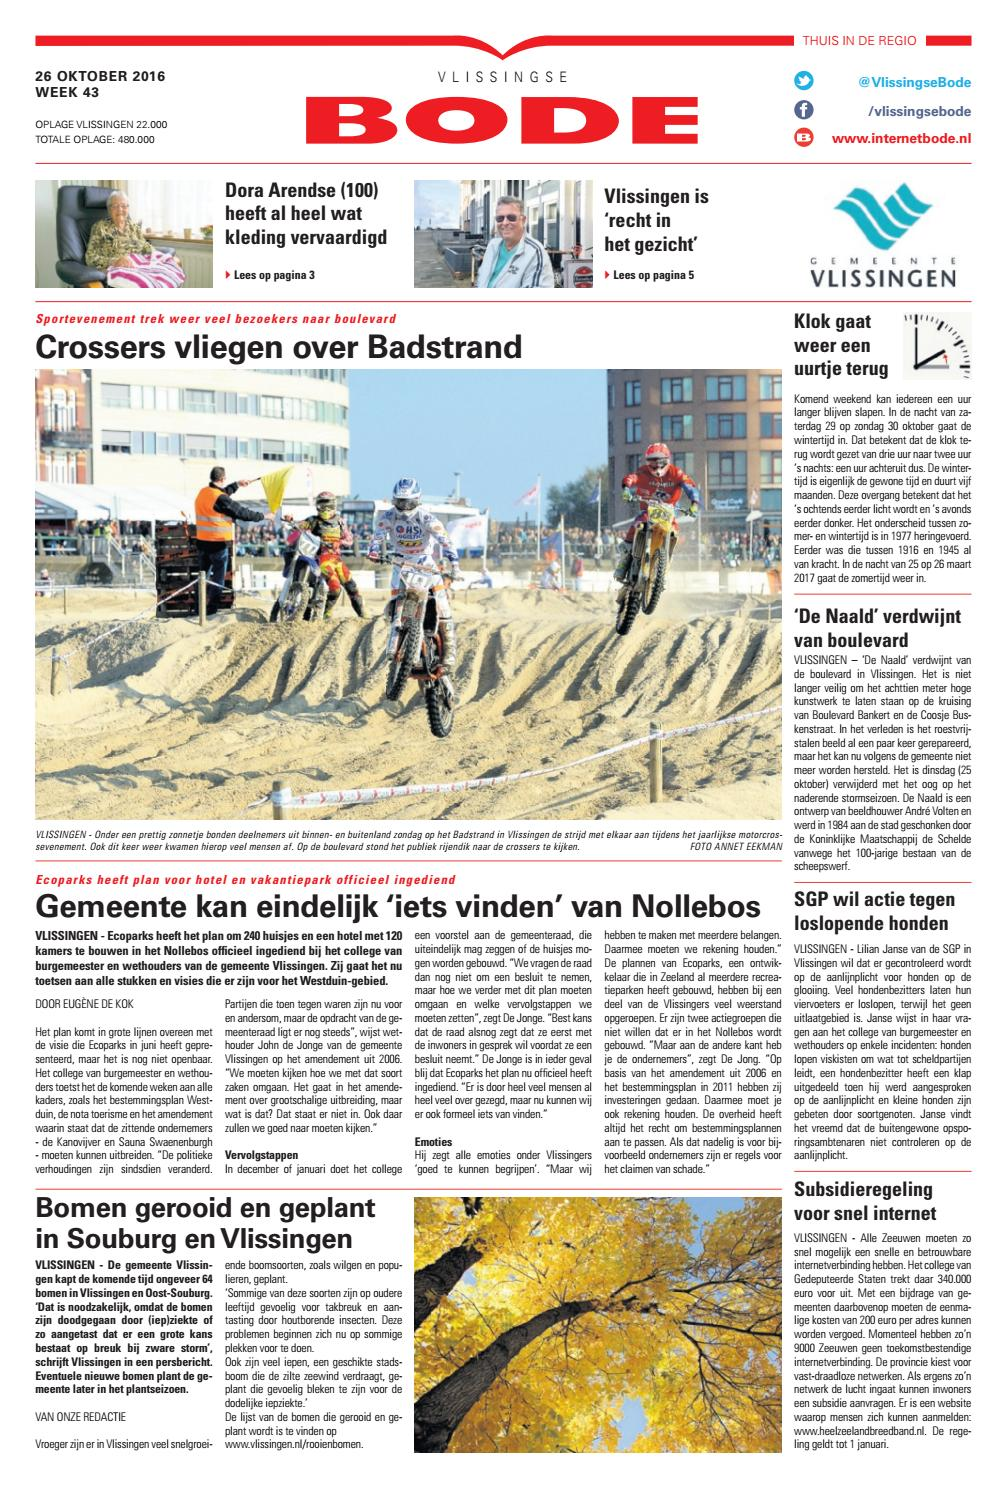 c10f4629e17ea3 Vlissingse Bode 26-10-2016 by Uitgeverij de Bode - issuu